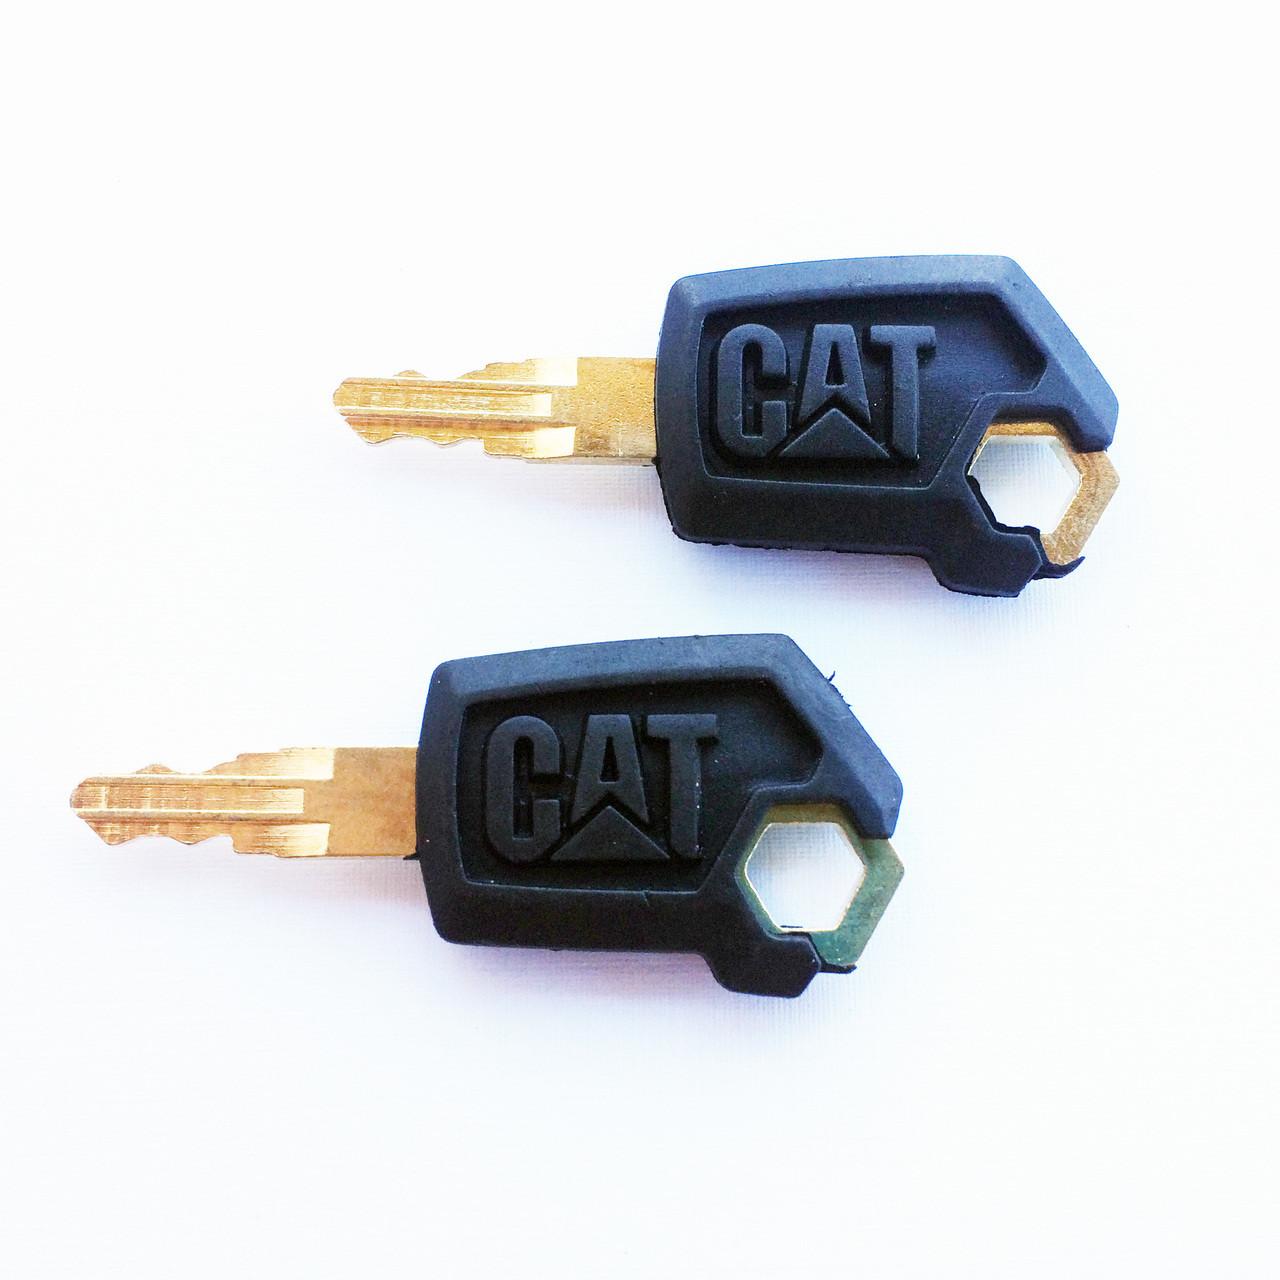 Cat 5P-8500 Equipment Keys